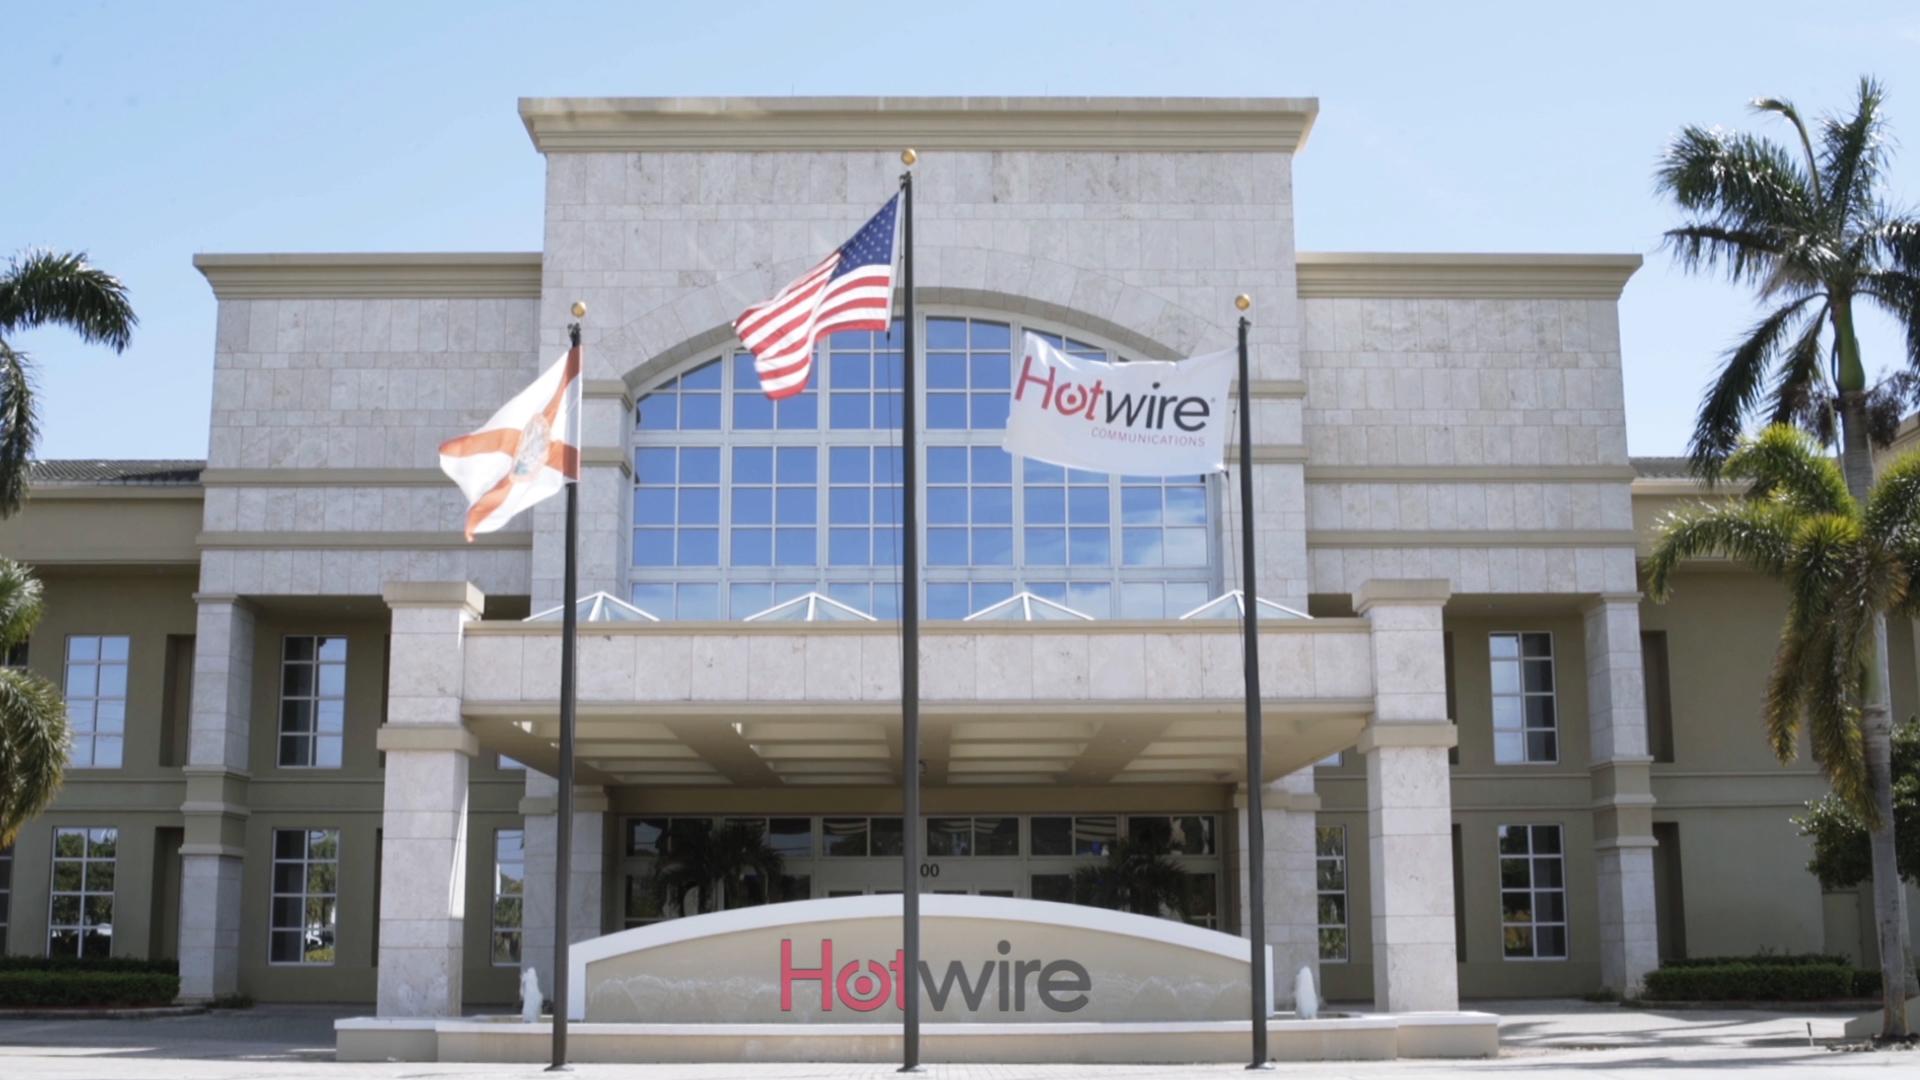 Hotwire Communications headquarters